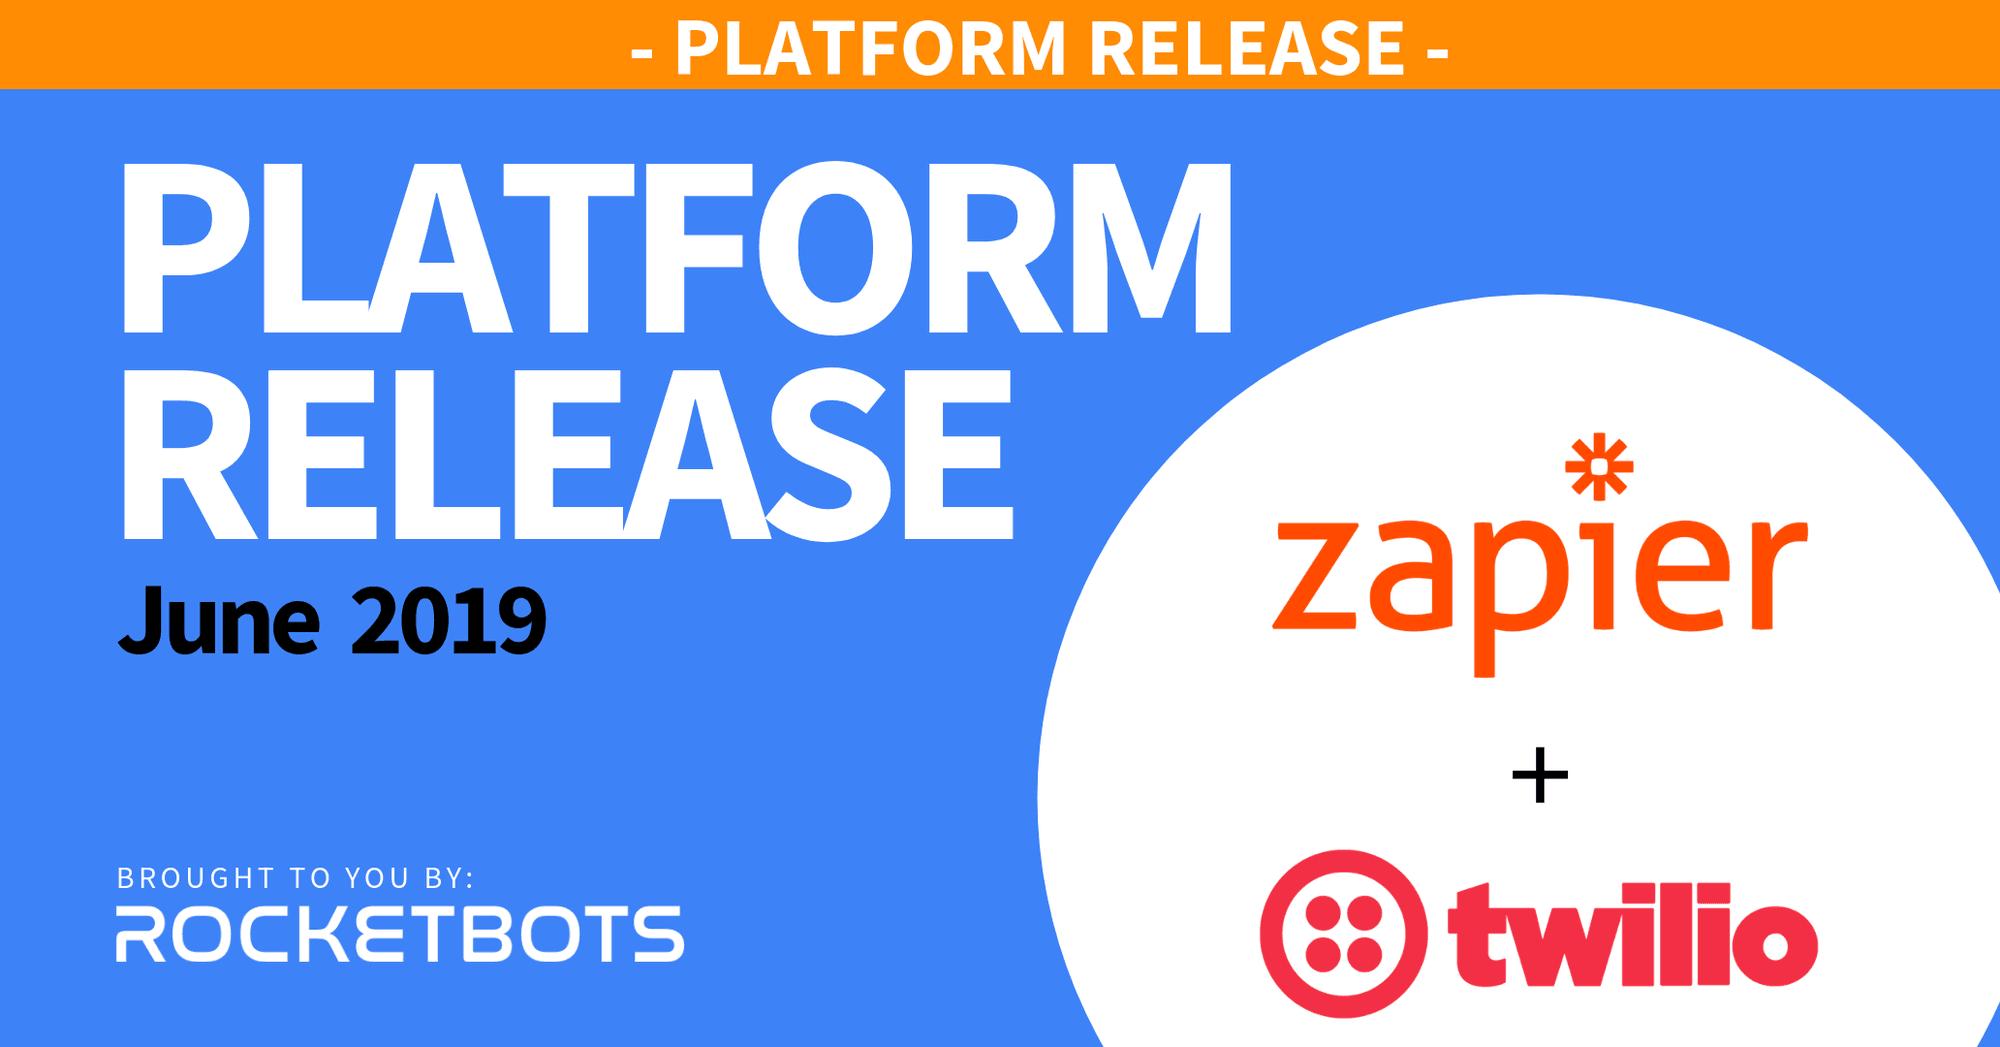 The June 2019 Release - Zapier & Twilio Integration